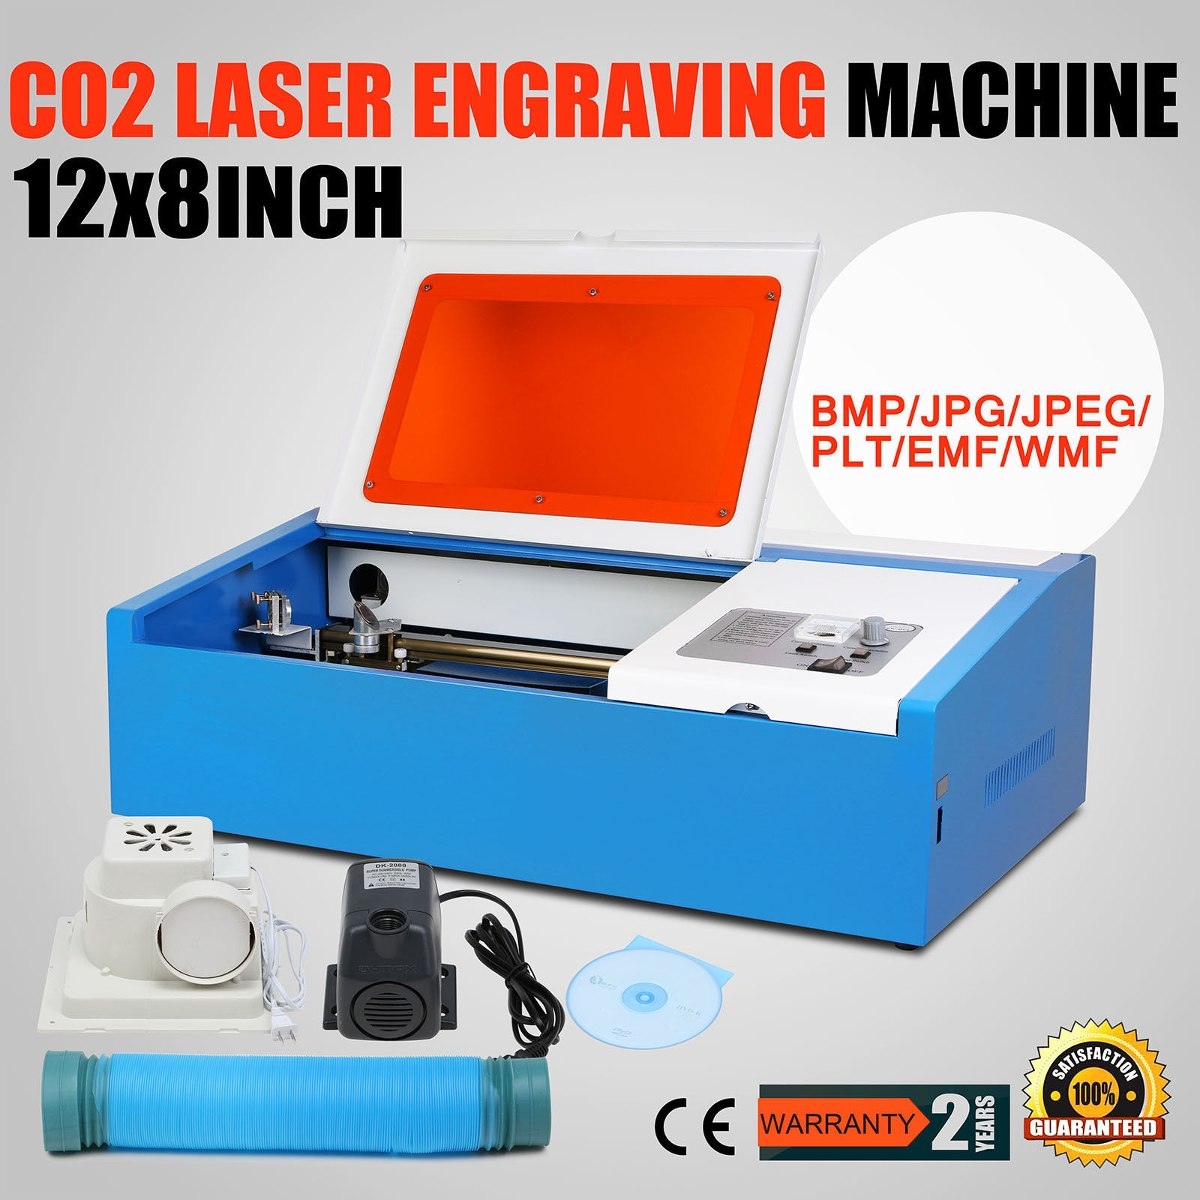 Maquina Cnc Cortadora Grabadora Laser Co2 19 800 00 En